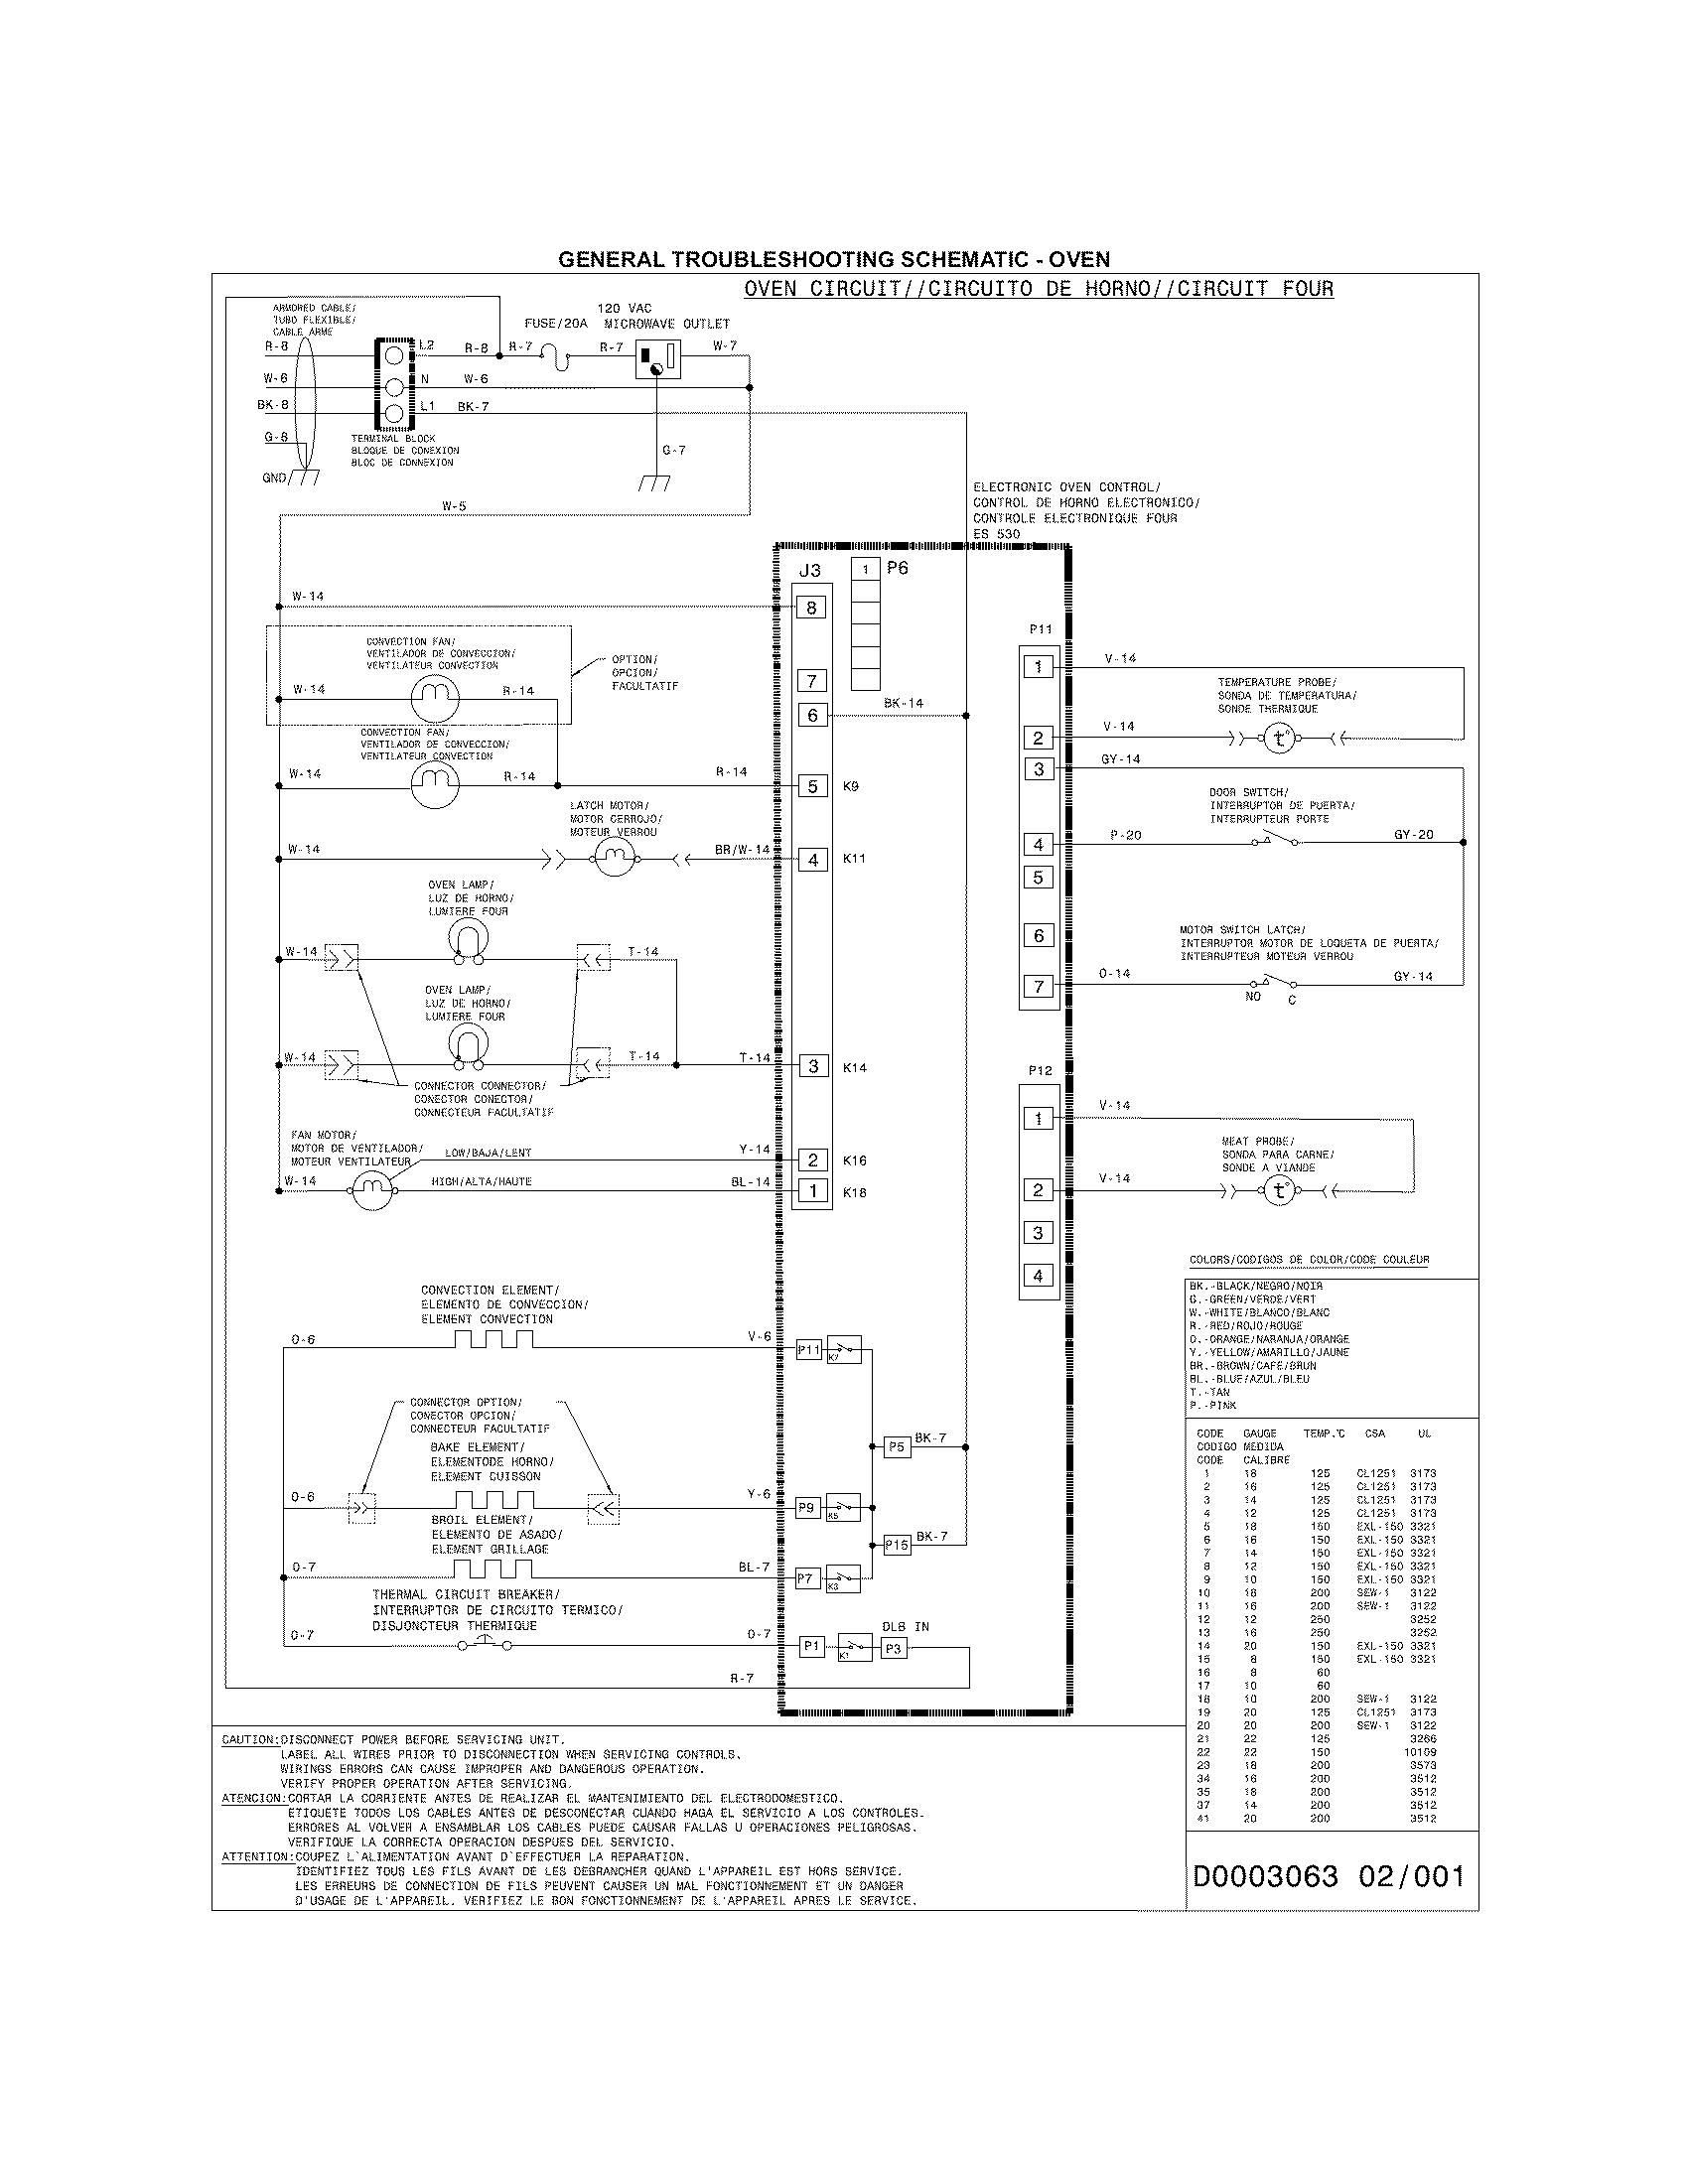 hight resolution of toaster wiring schematic wiring diagram centrewrg 1757 toaster oven wiring diagramtoaster wiring schematic 21